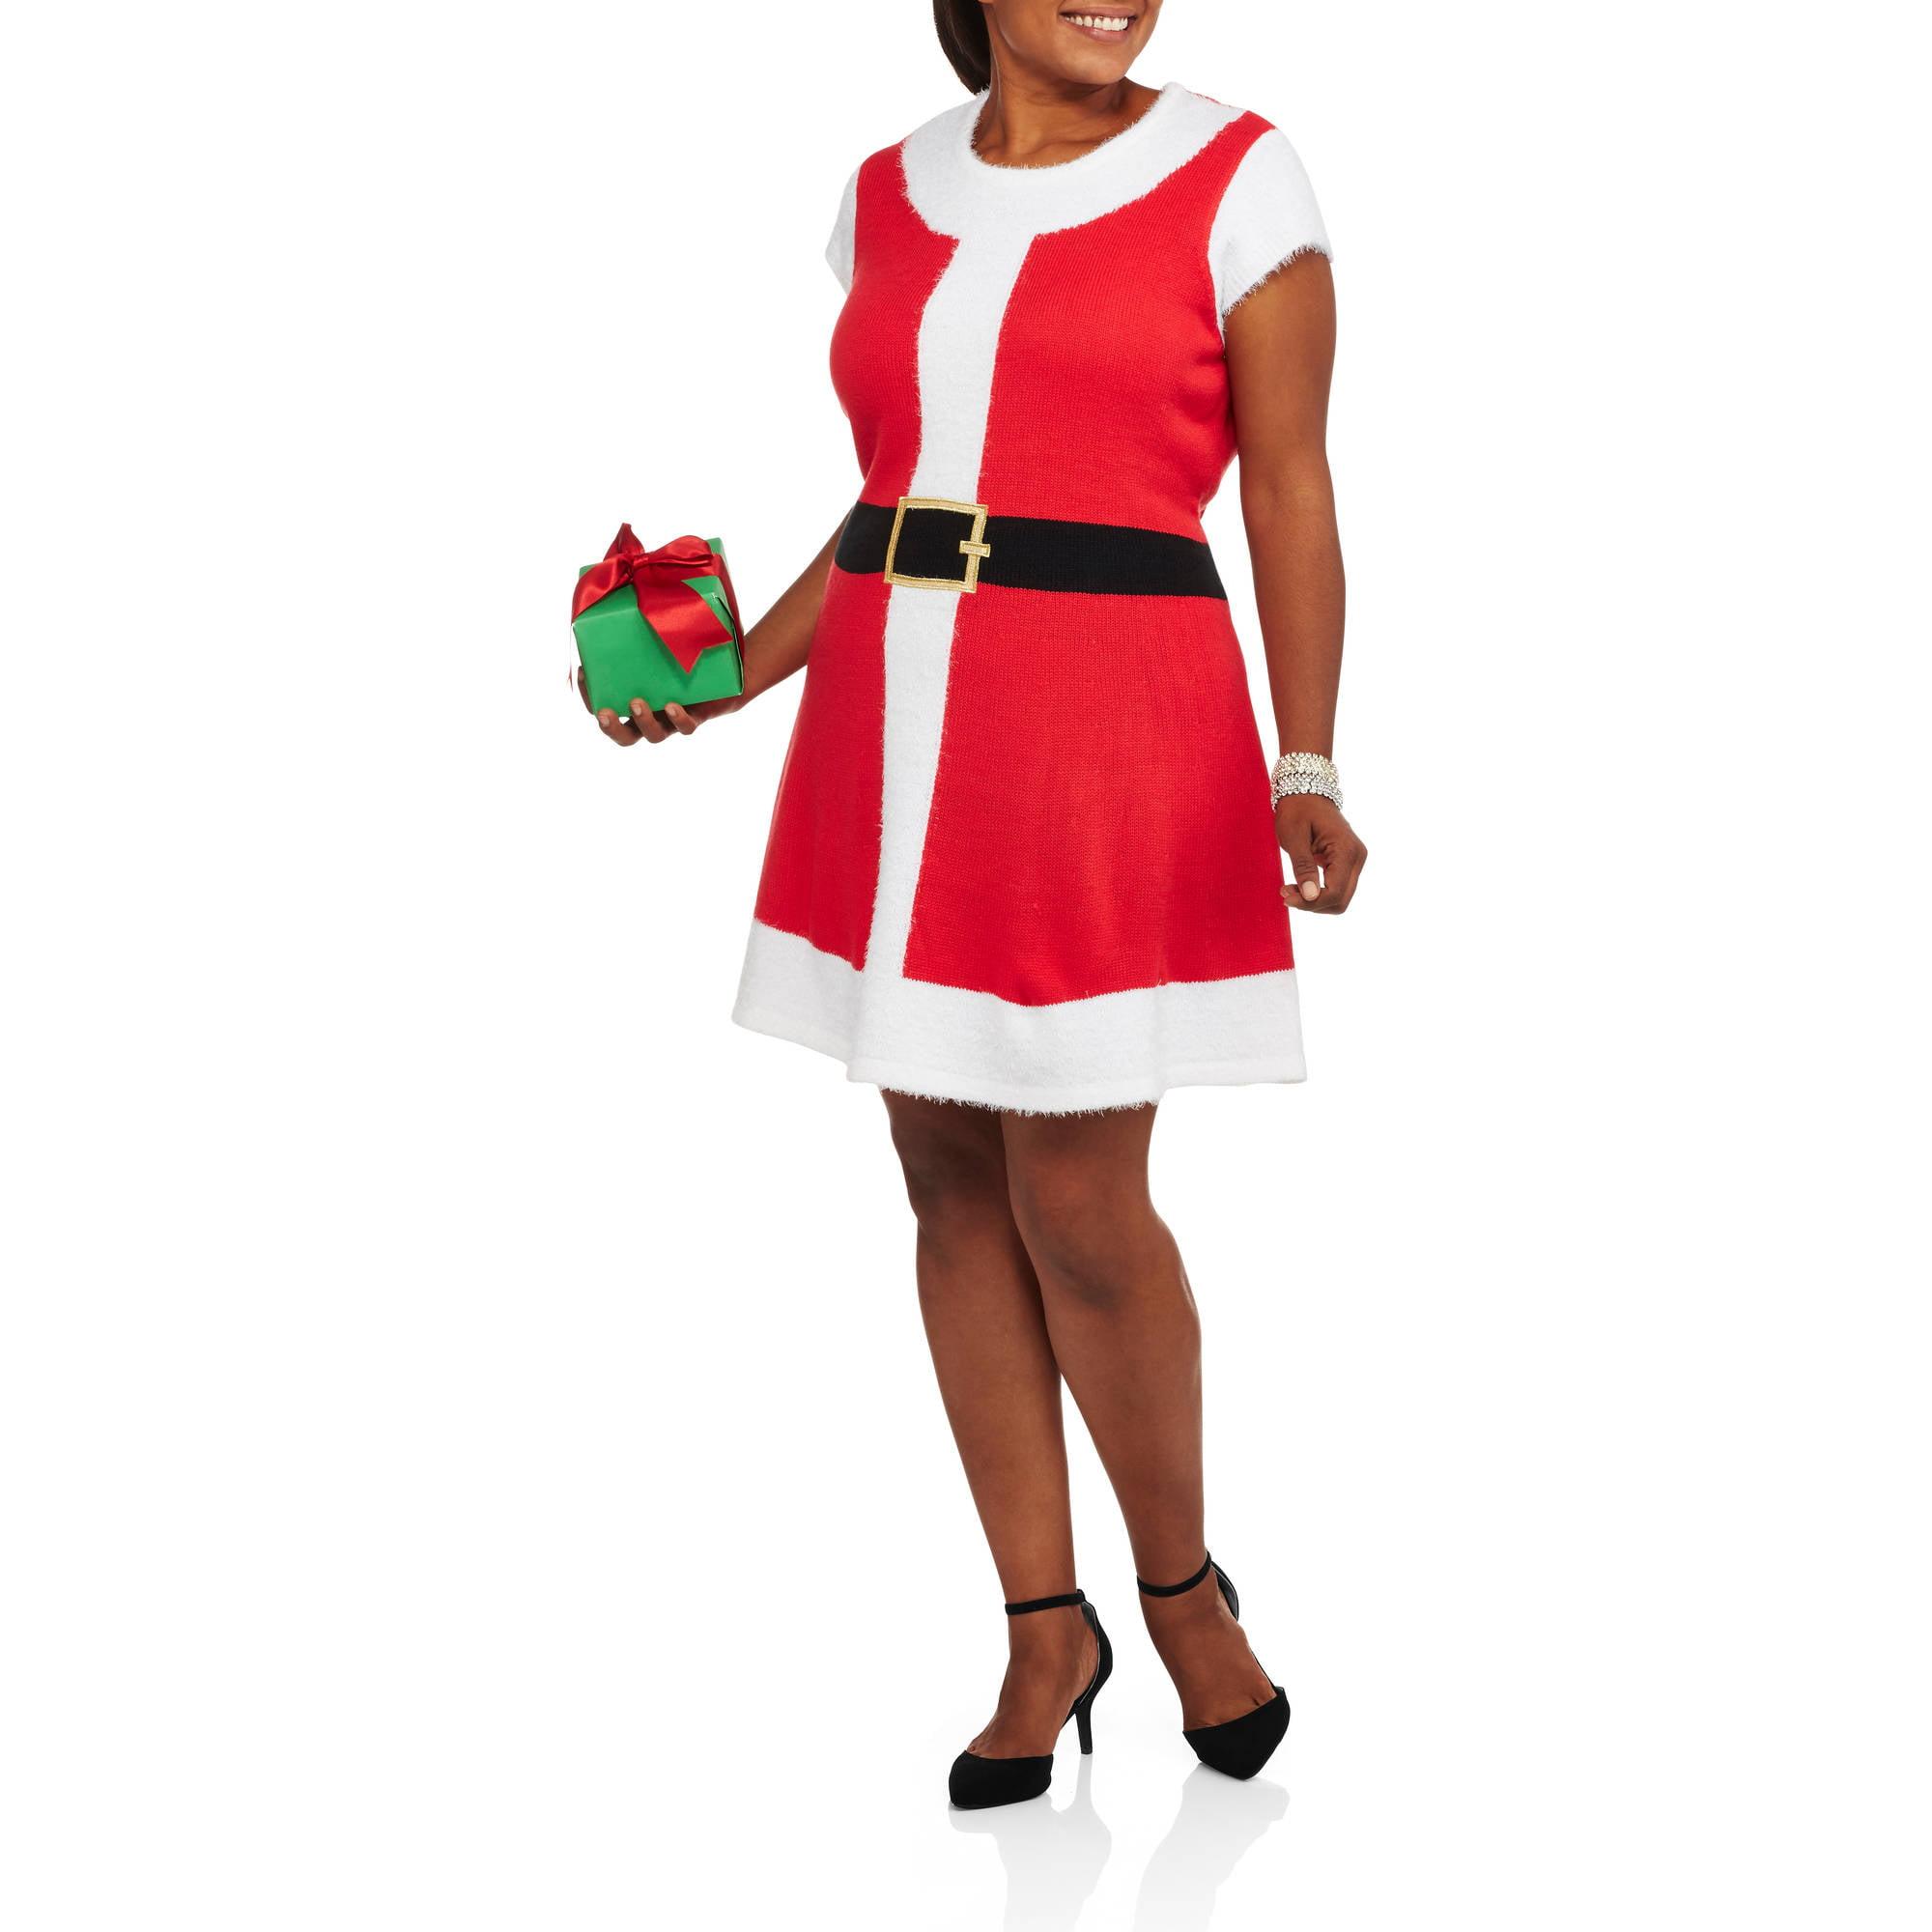 fa94c3942ac8c Holiday Time - Women'S Plus Christmas Sweater Dress - Santa's Night ...